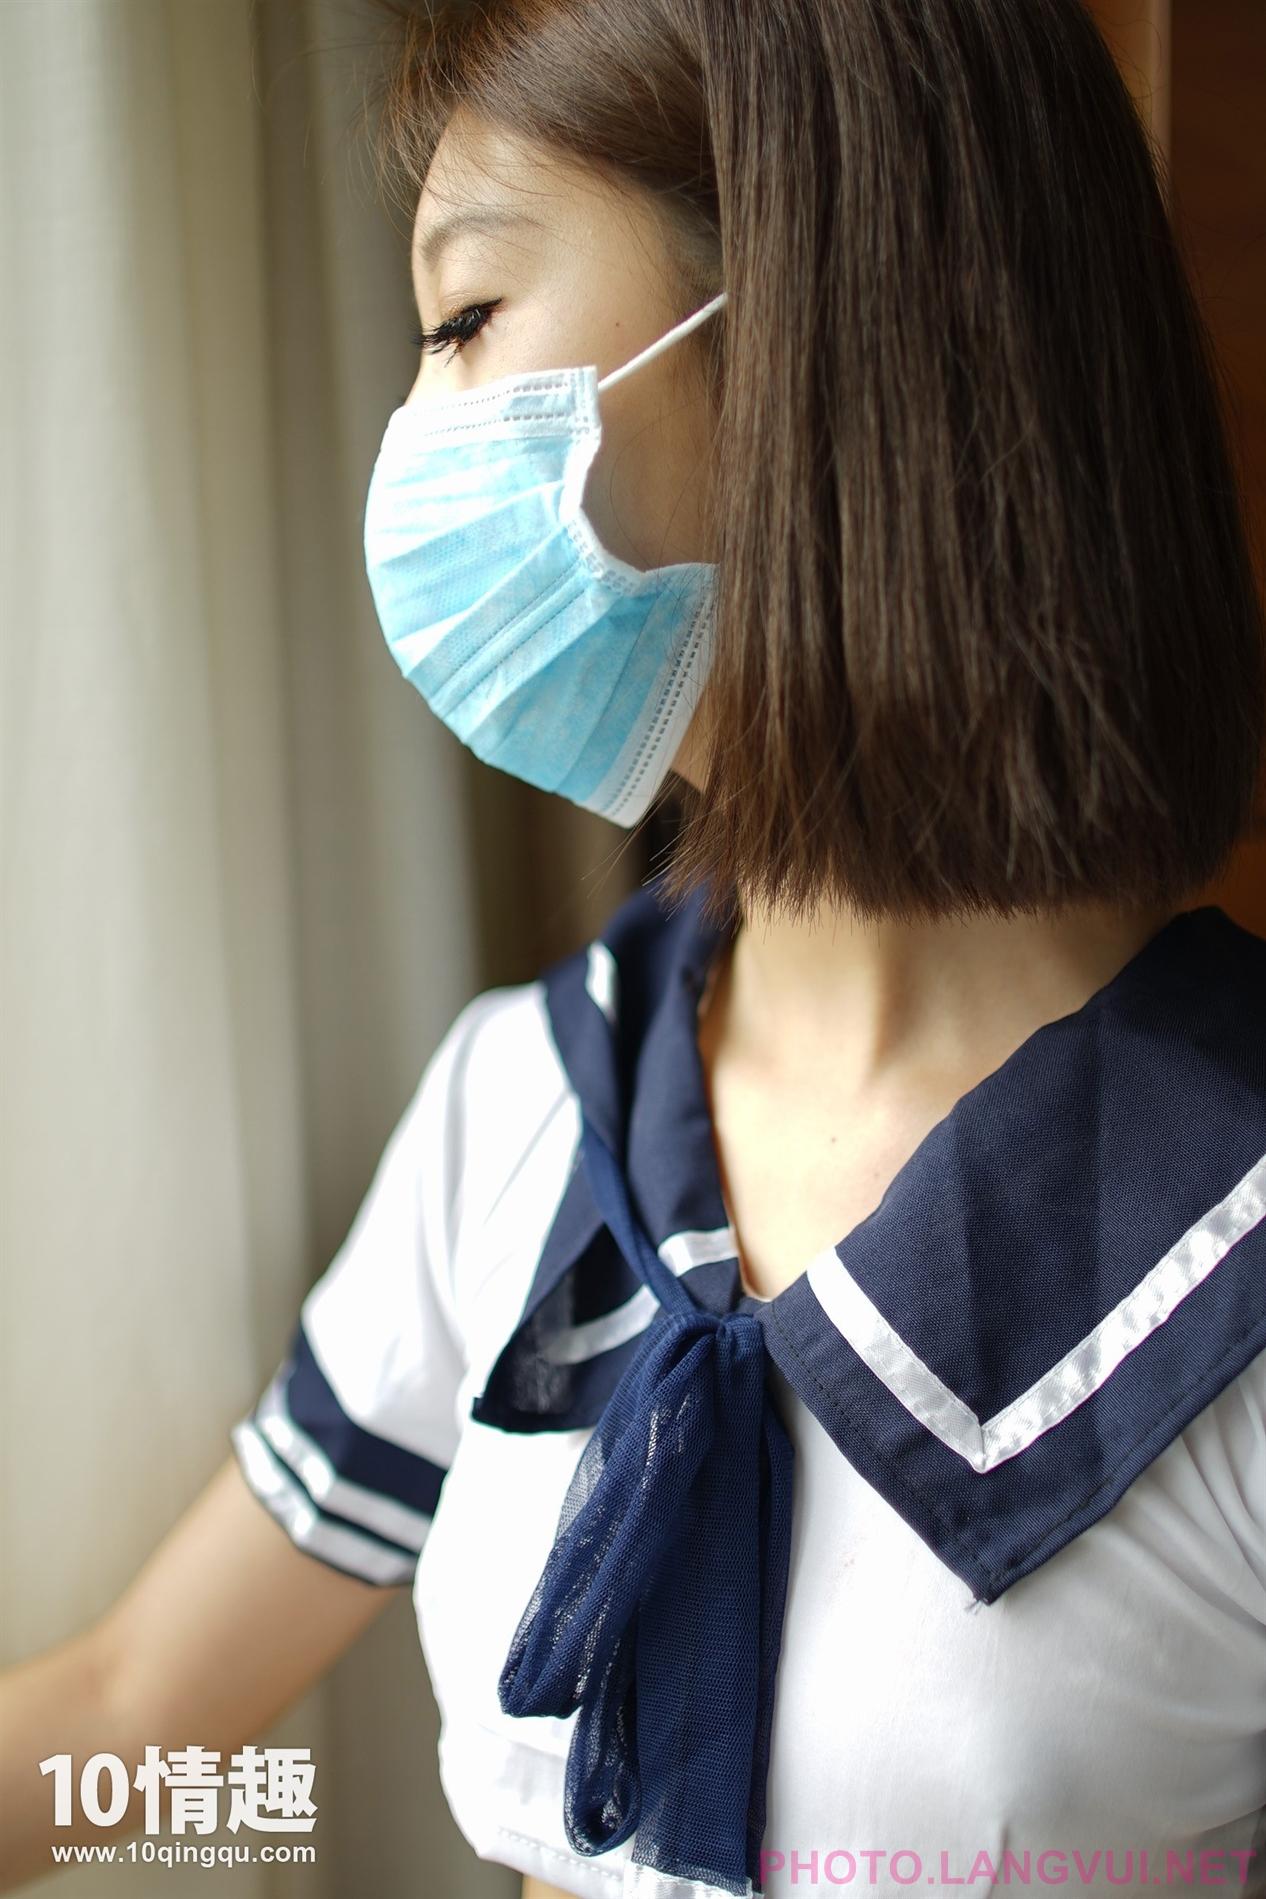 10QingQu Mask Series No 117